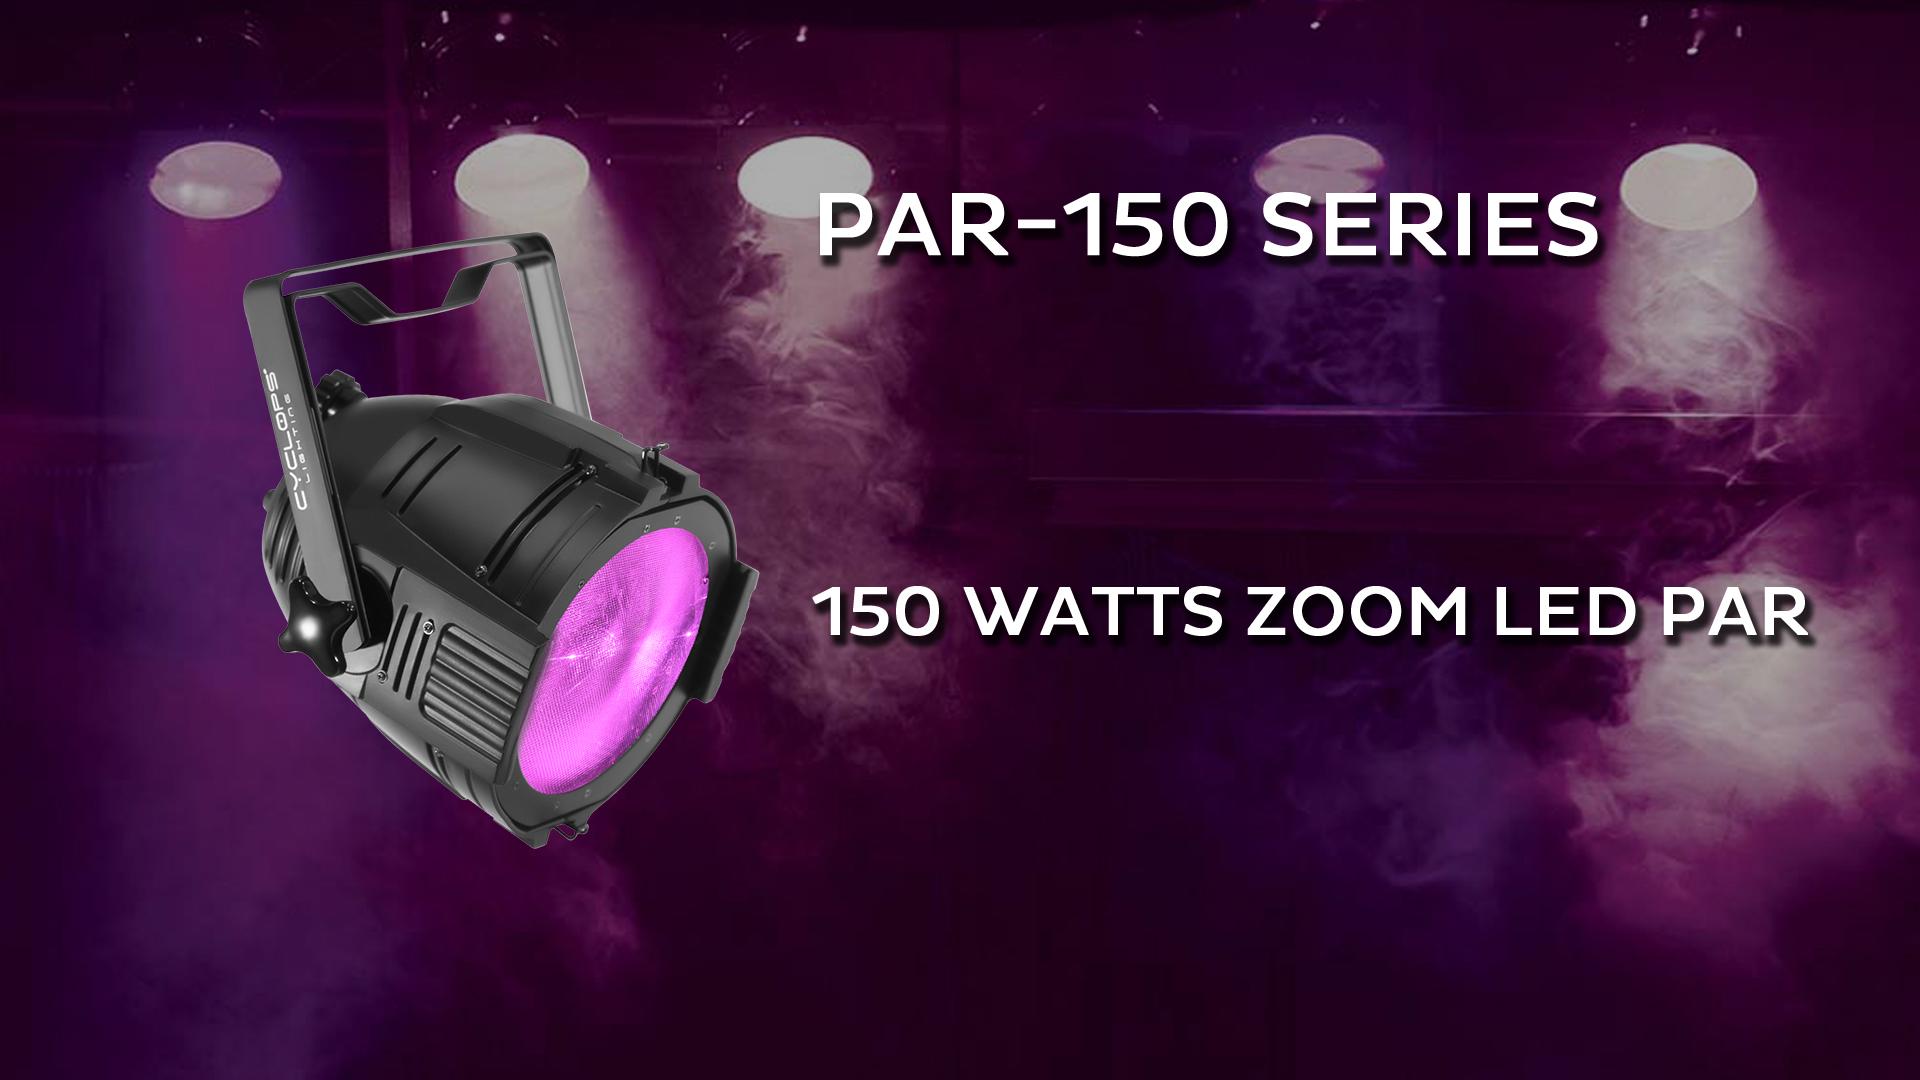 PAR-150series-youtube-template